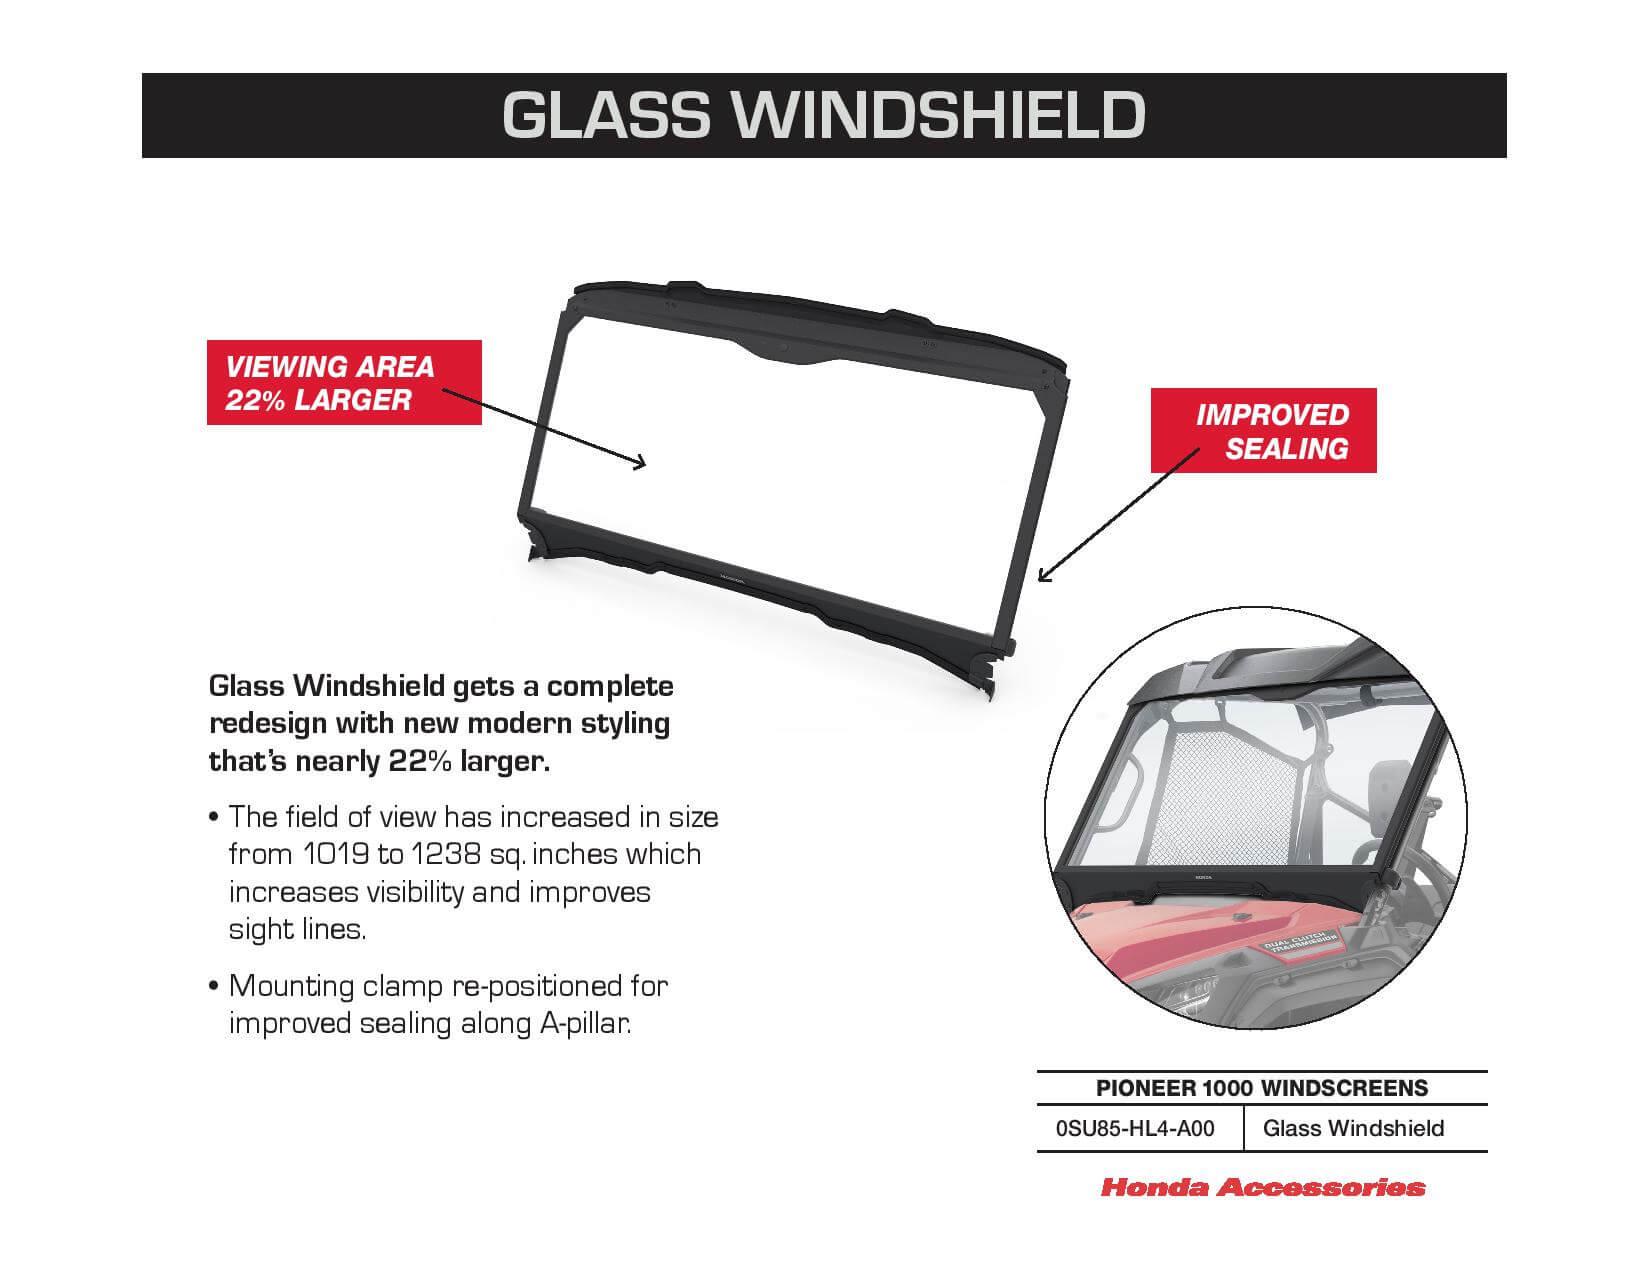 Honda Pioneer 1000 Glass Windshield / Windscreen | 0SU85-HL4-A00